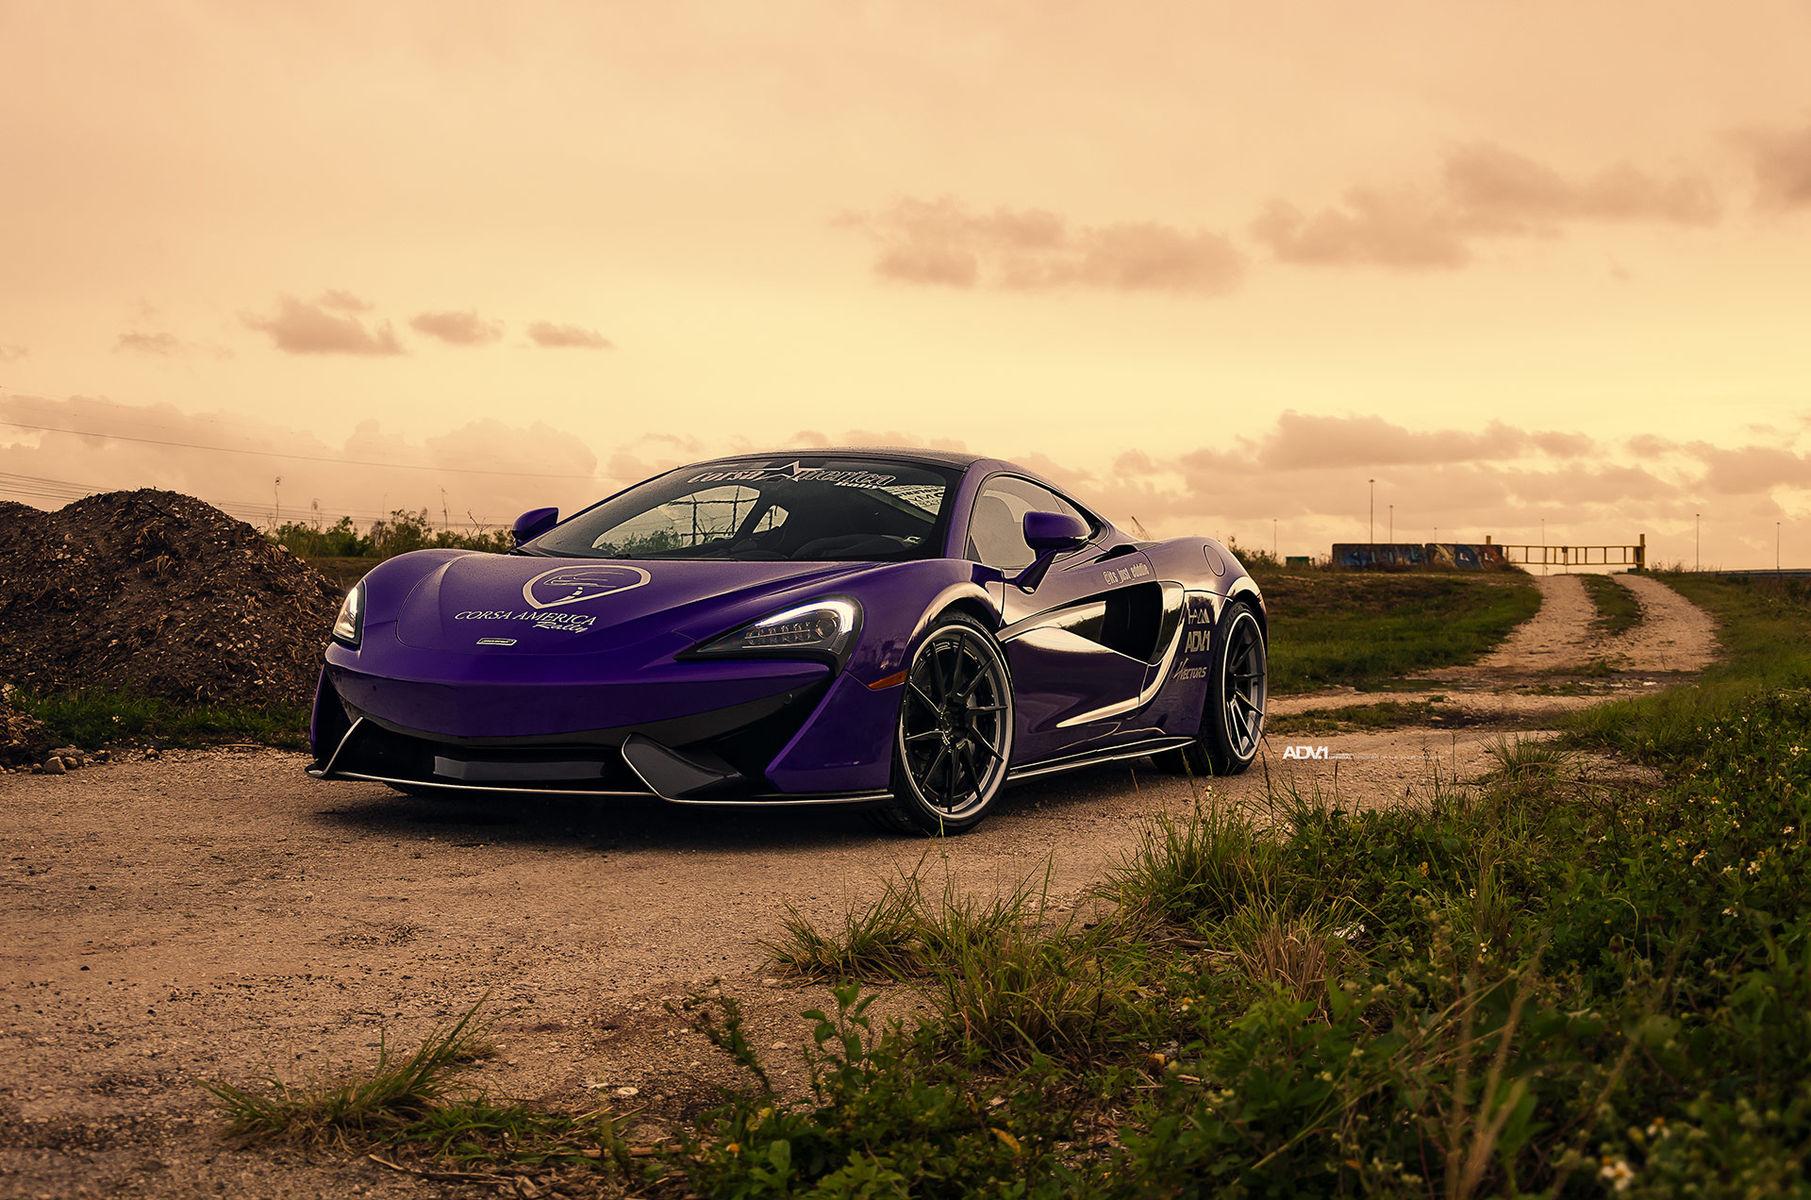 McLaren 570S | Purple McLaren 570S - ADV.1 Directional ADV10R Track Spec CS Series Wheels